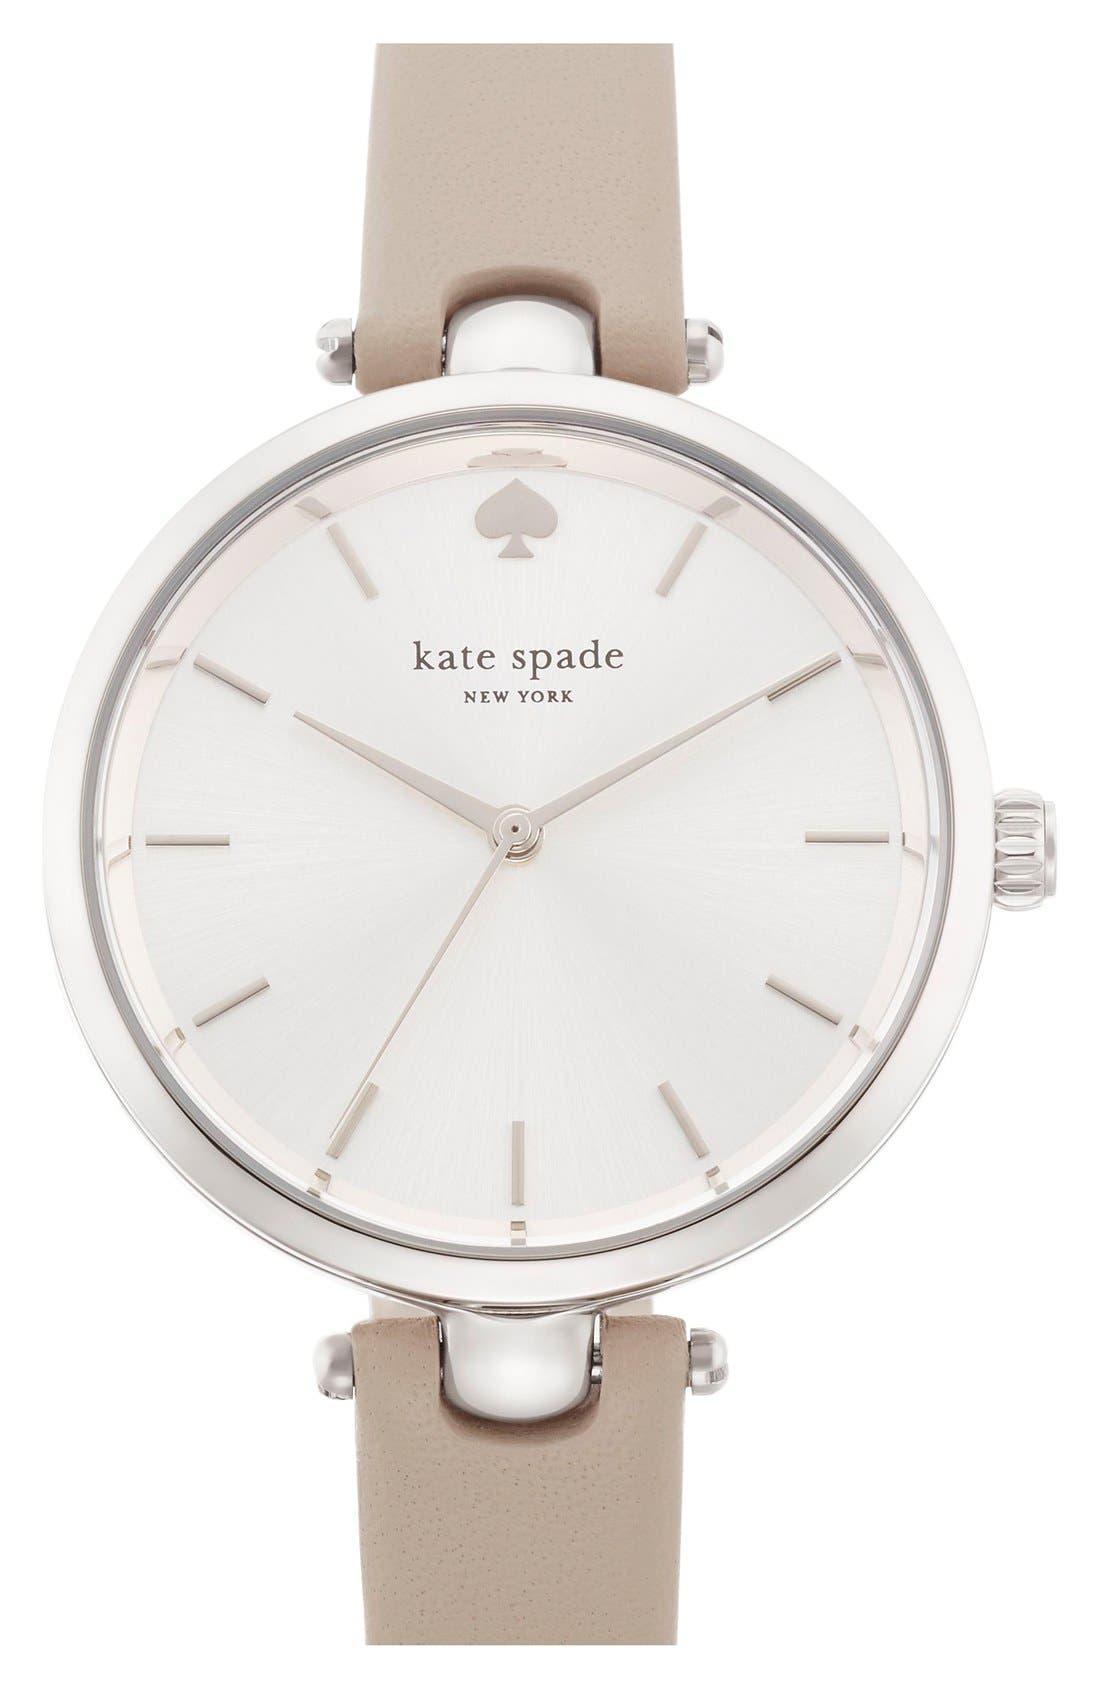 KATE SPADE NEW YORK 'holland' round watch, 34mm, Main, color, CLOCKTOWER GREY/ SILVER